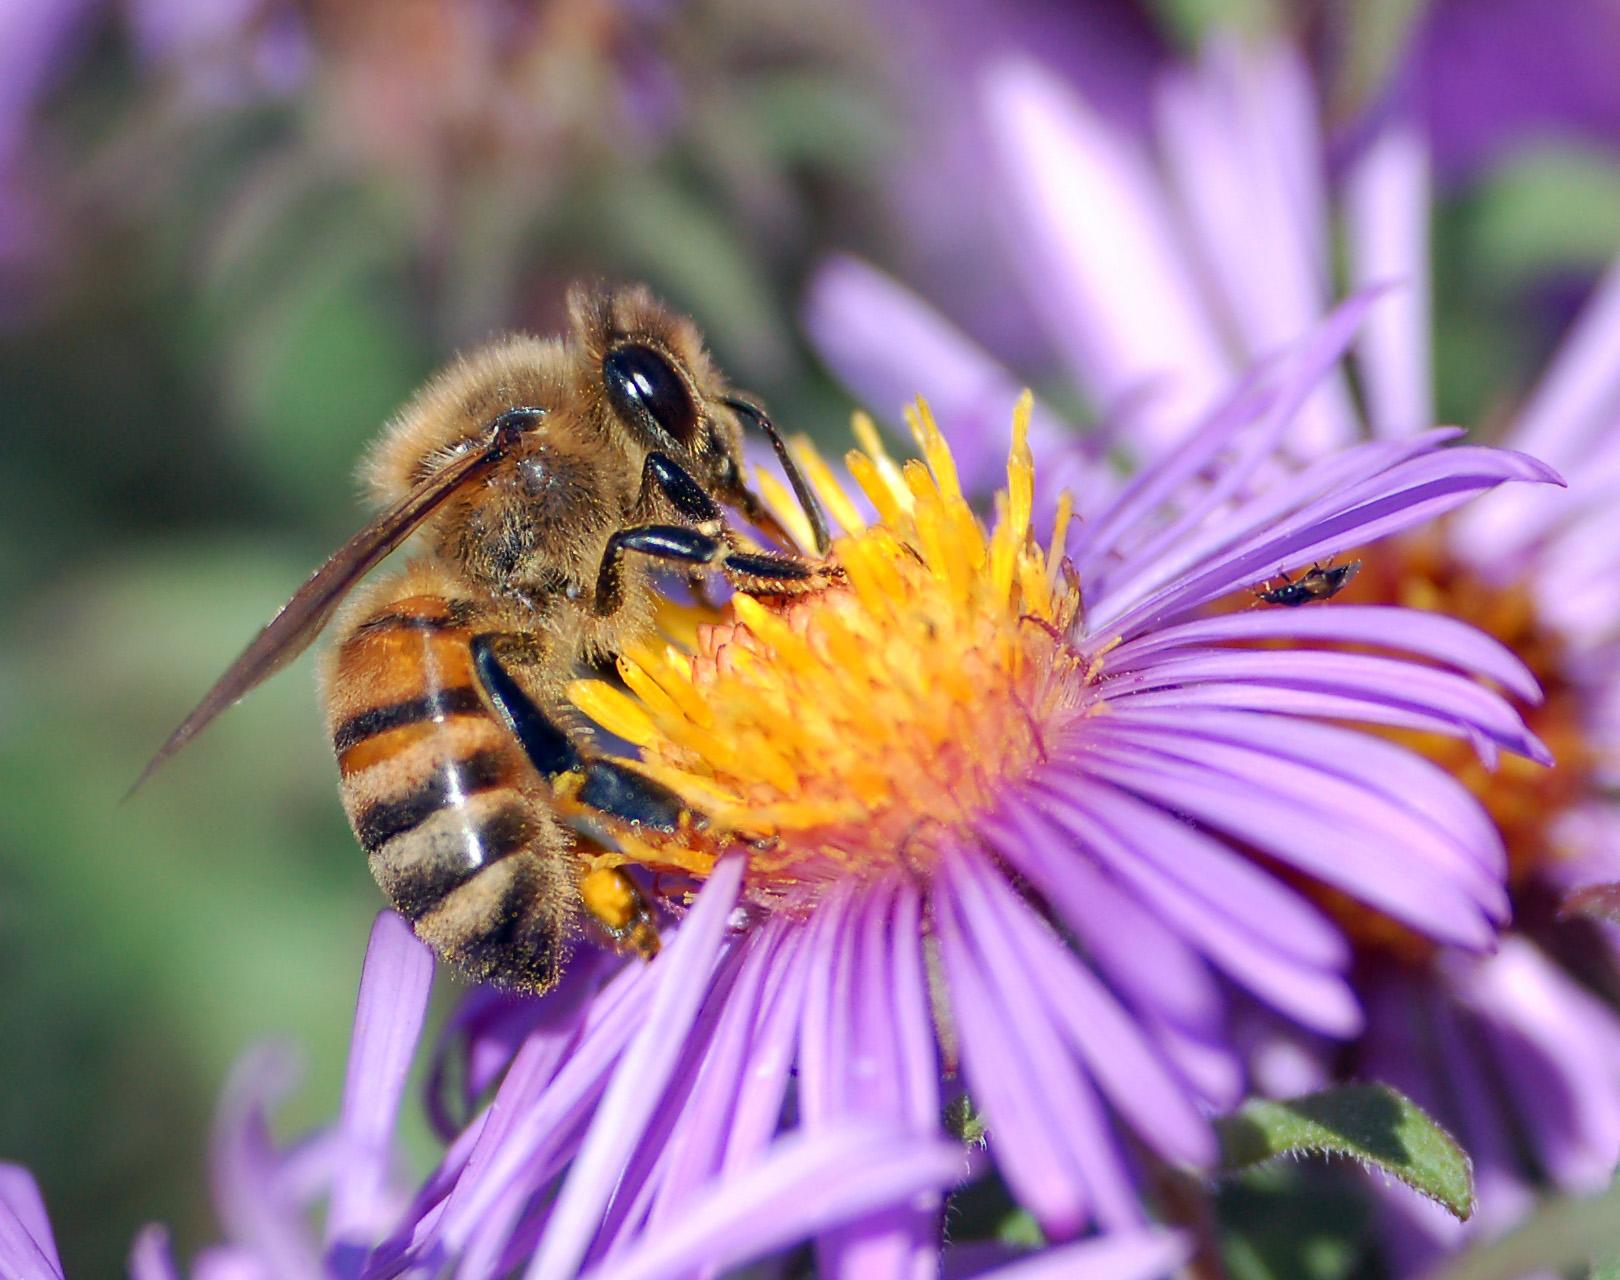 Honey bee behavior predicts coming natural disaster